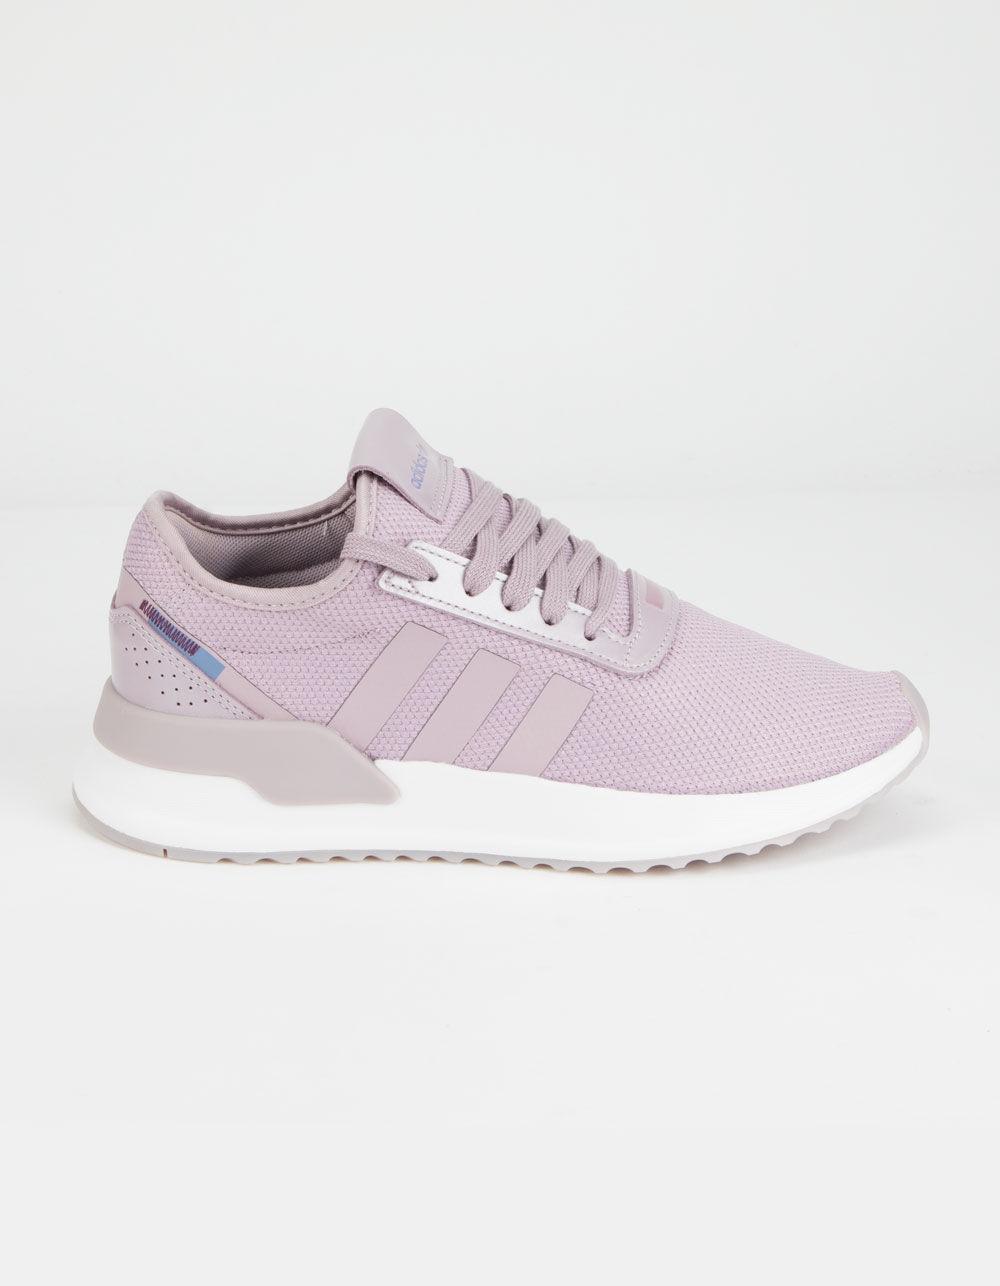 ADIDAS U_Path X Chalk Purple & Cloud White Shoes